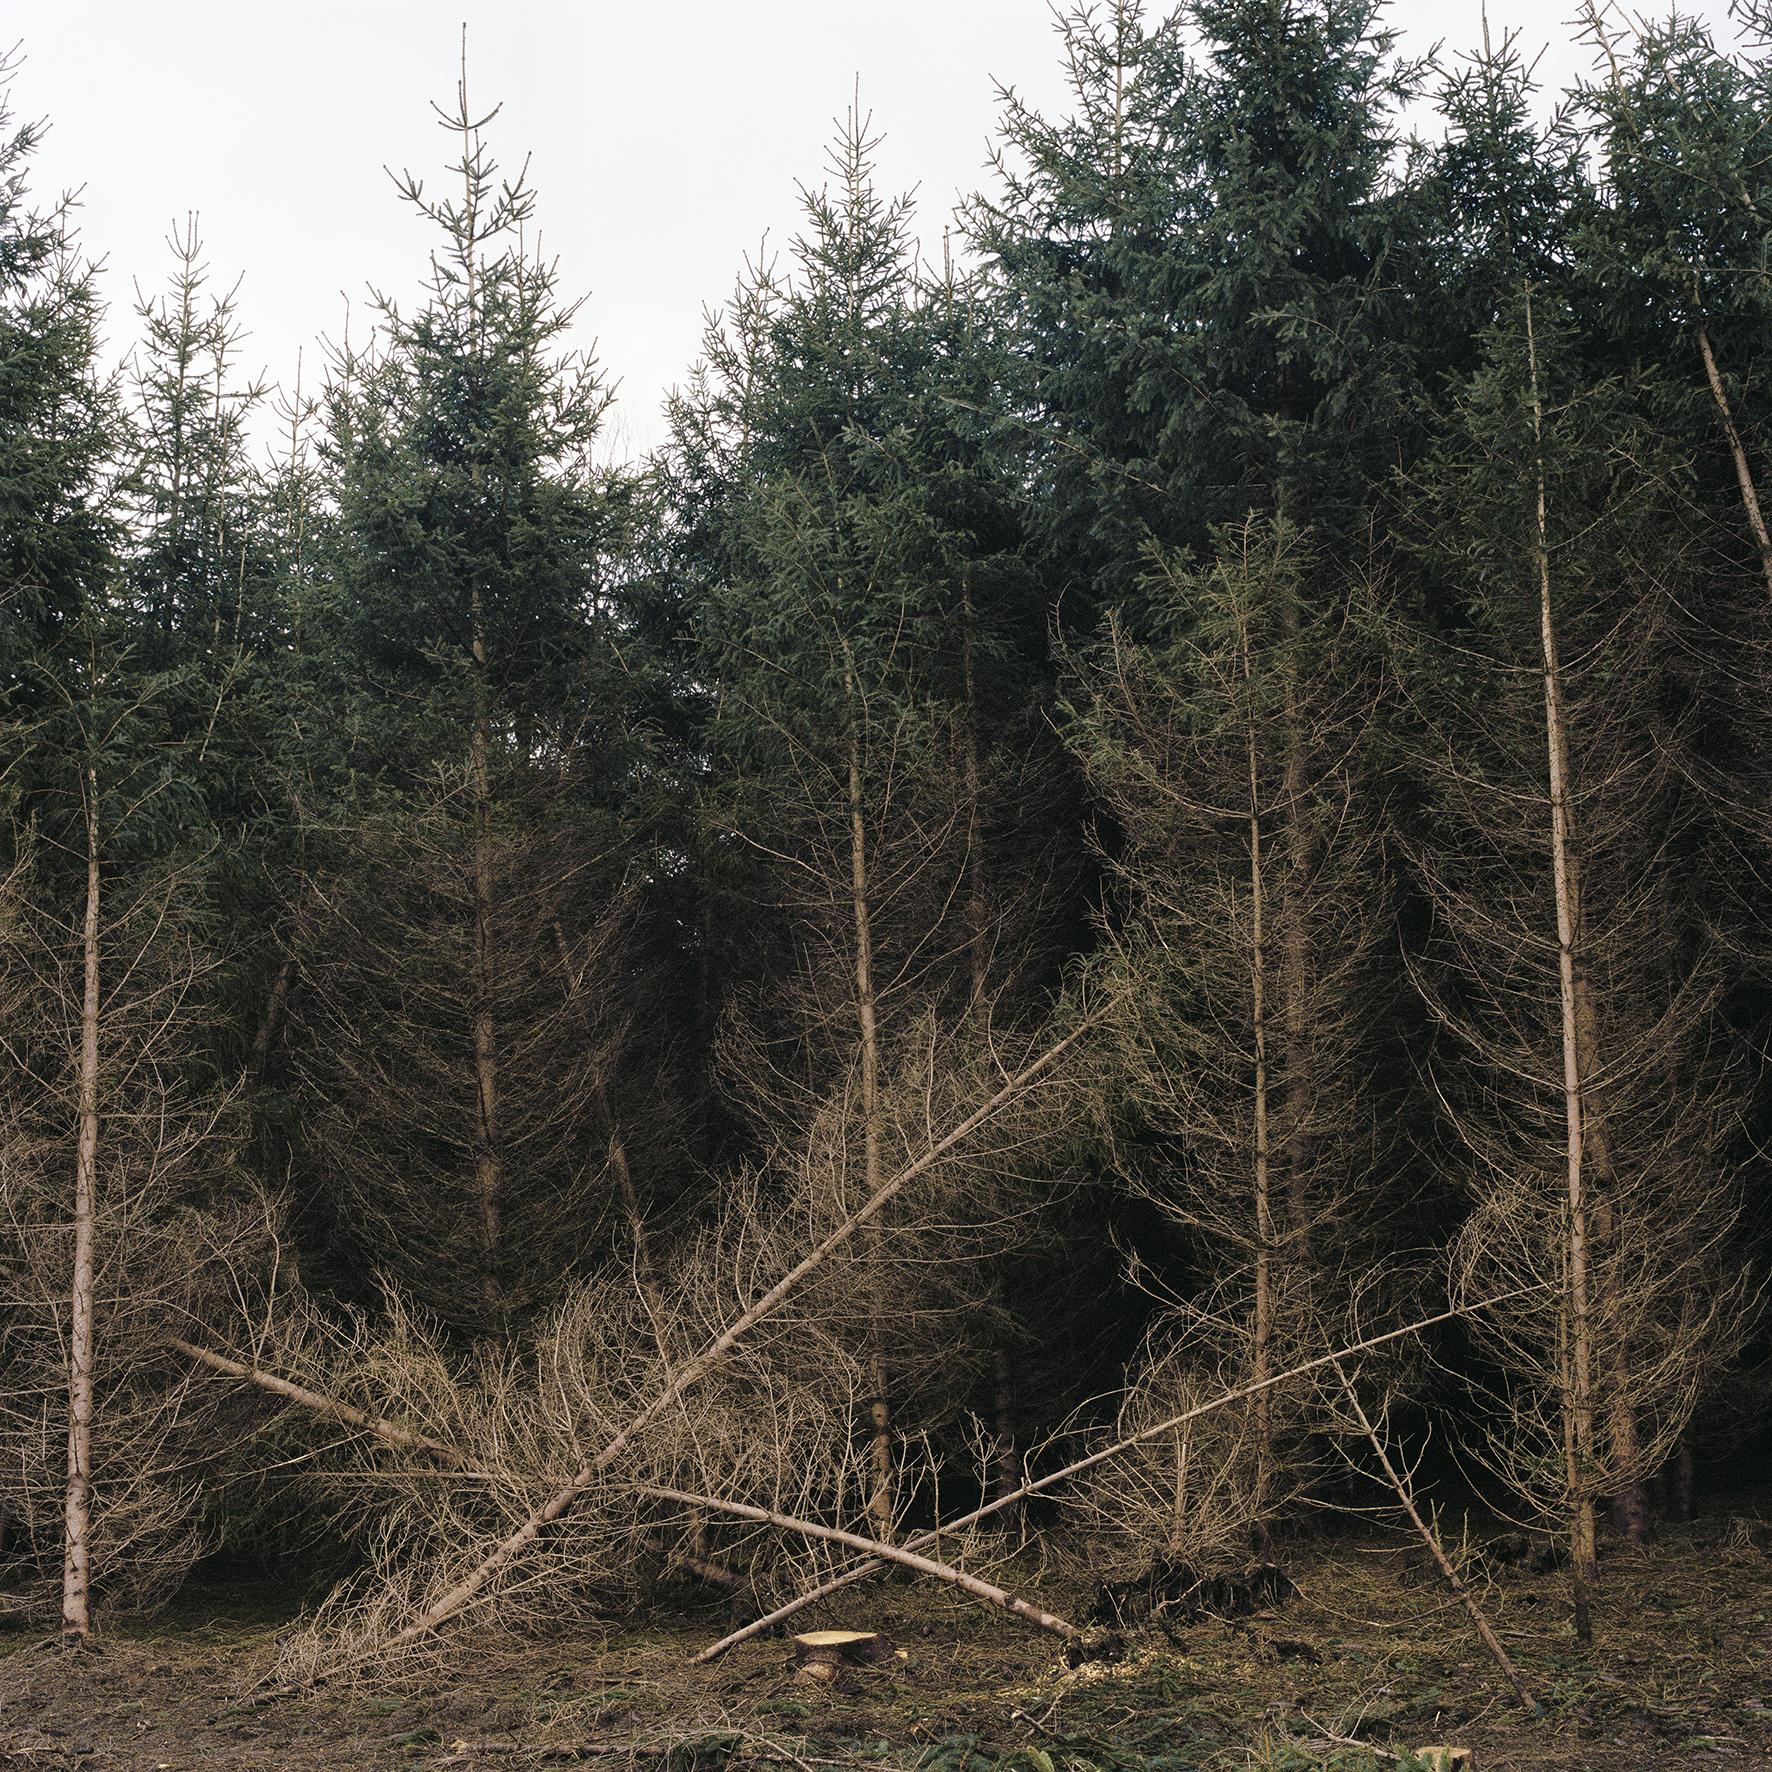 Maelle Collin_Fir Trees_WEB.jpg